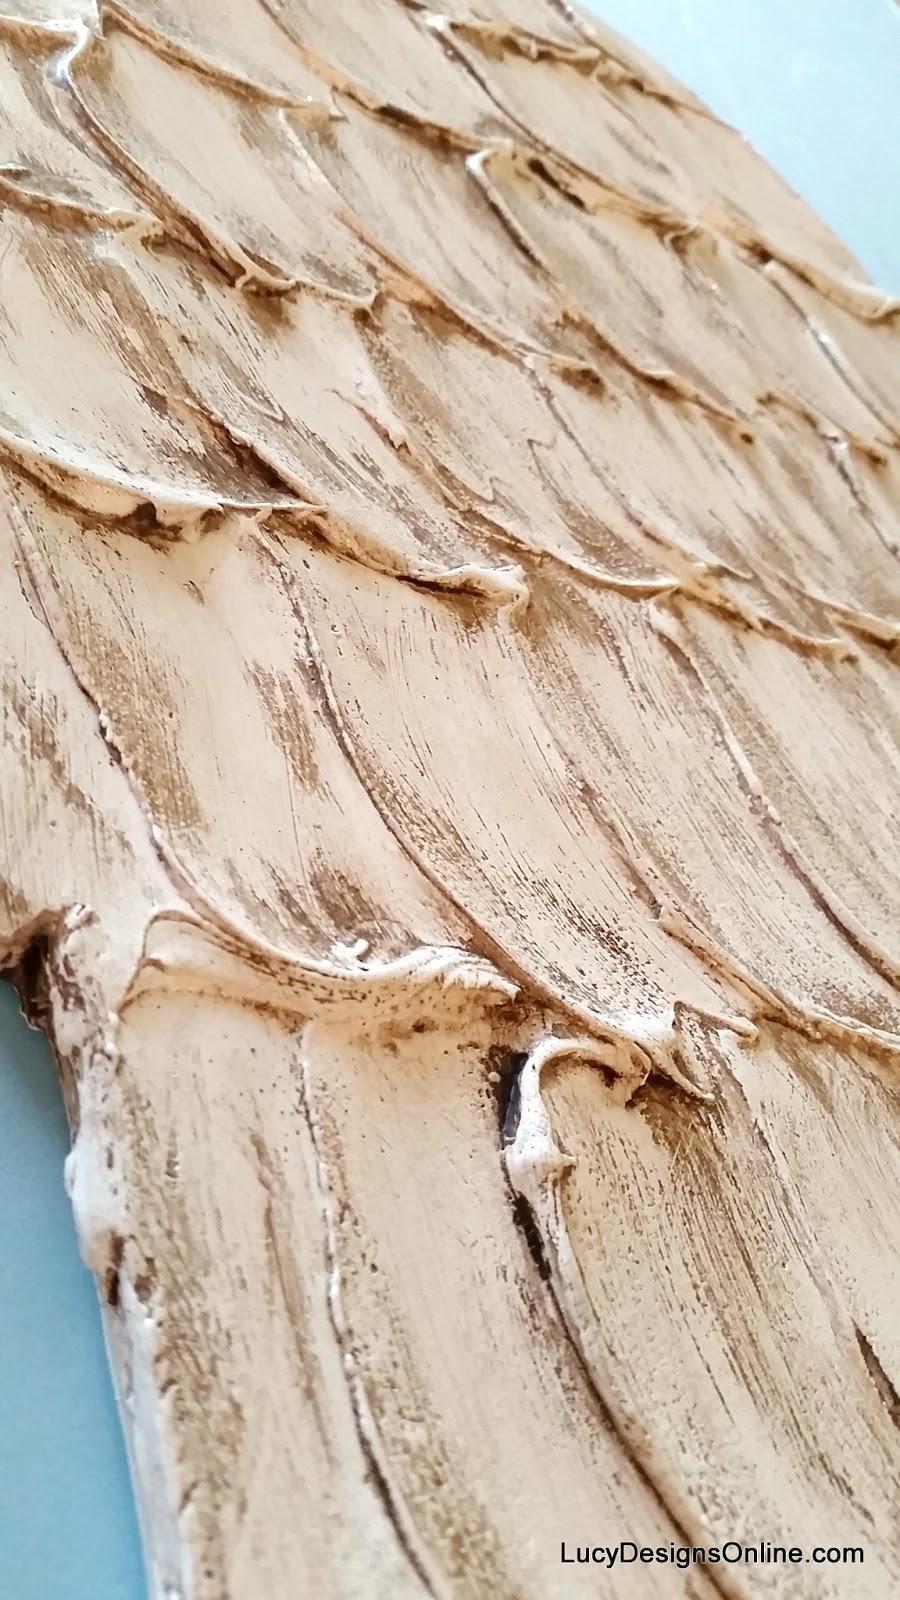 Cute wood angel wing art